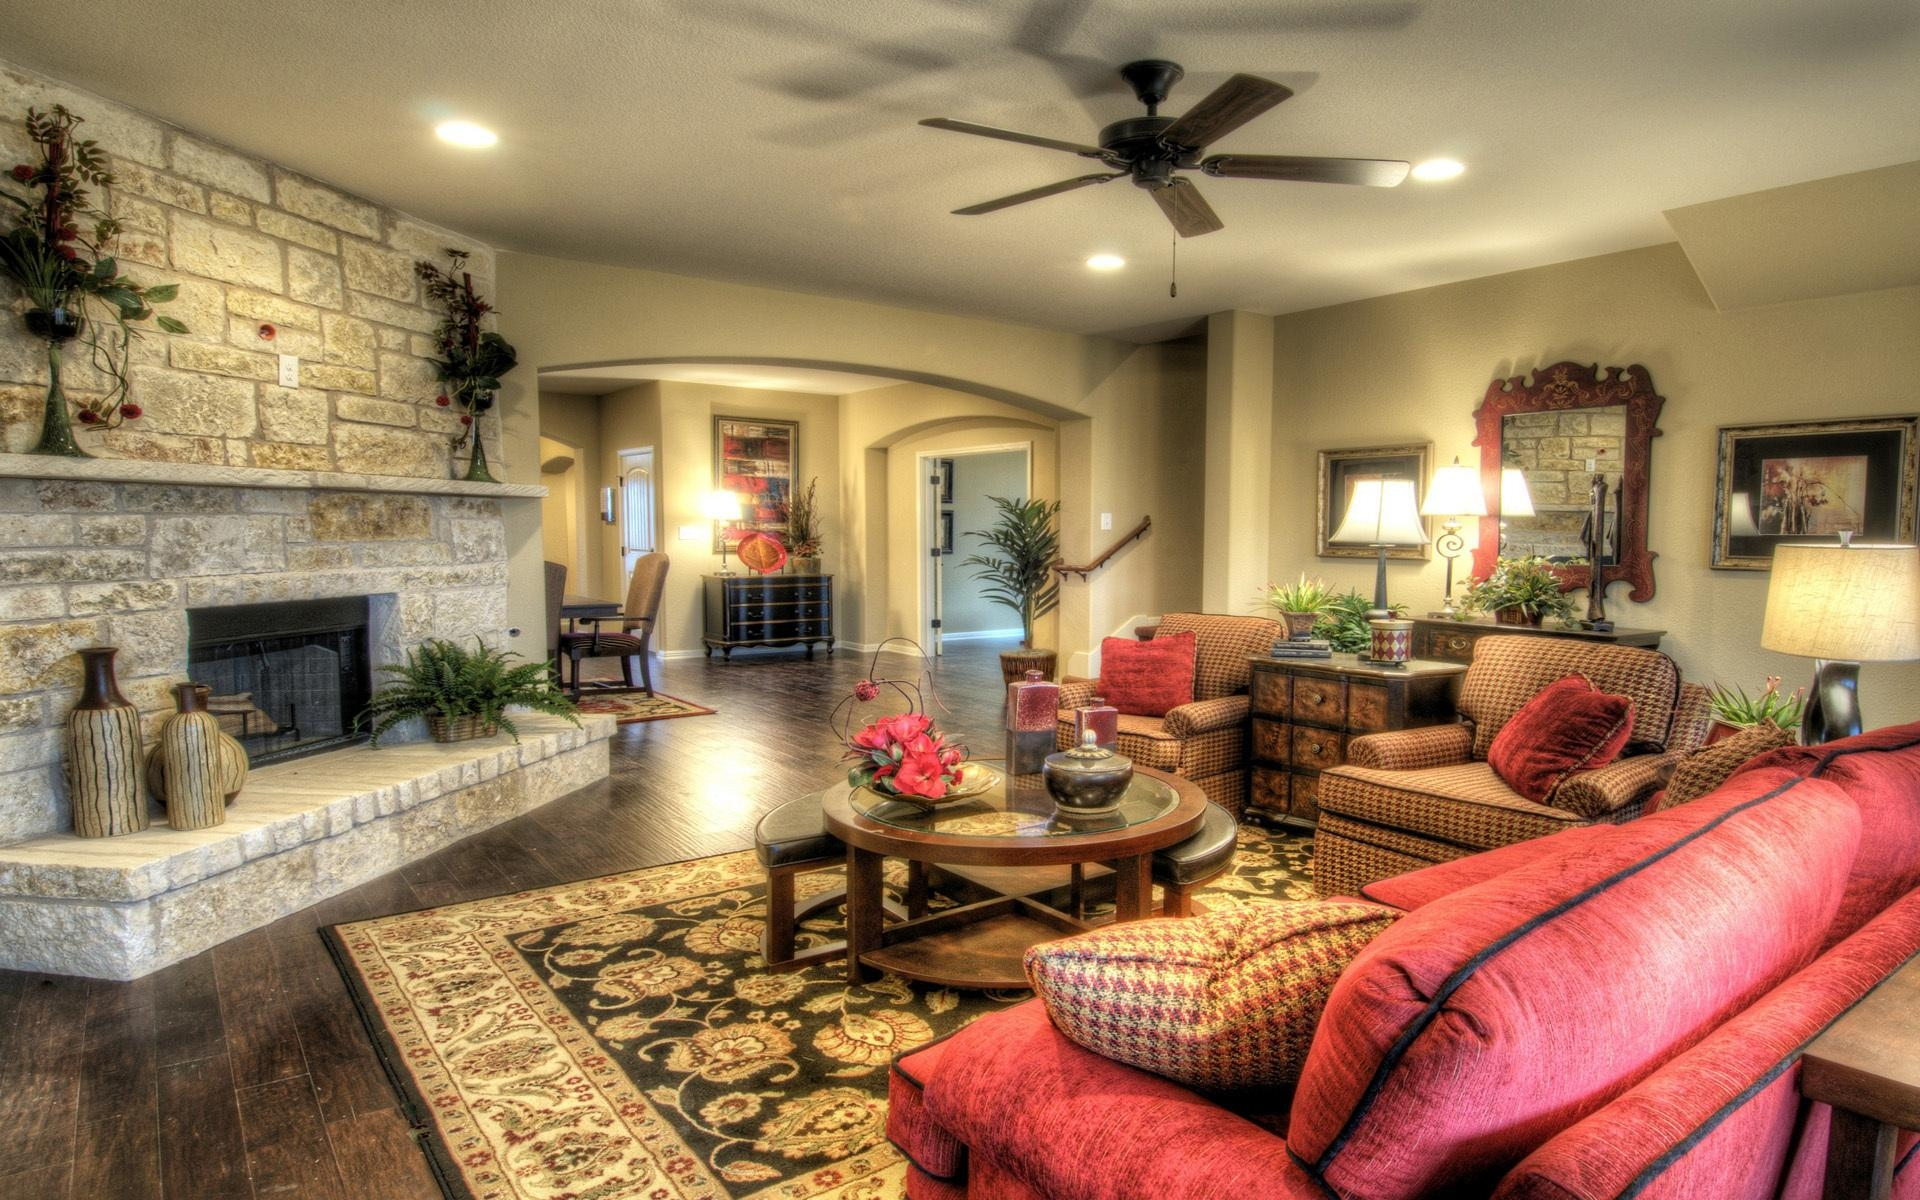 интерьер комната камин стол ковер interior bathroom fireplace table carpet загрузить